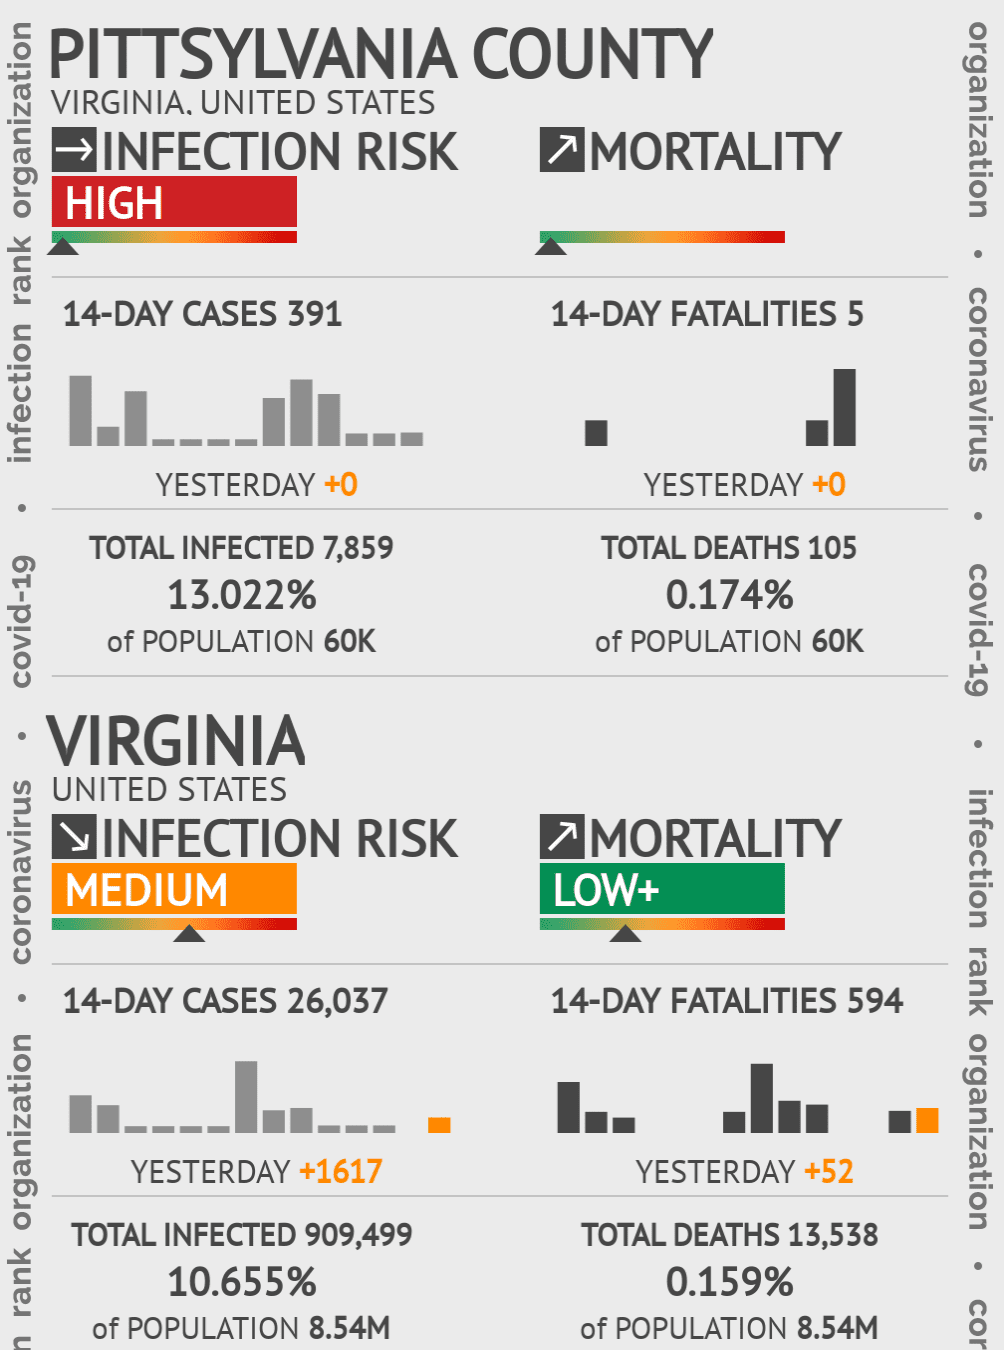 Pittsylvania County Coronavirus Covid-19 Risk of Infection on July 24, 2021